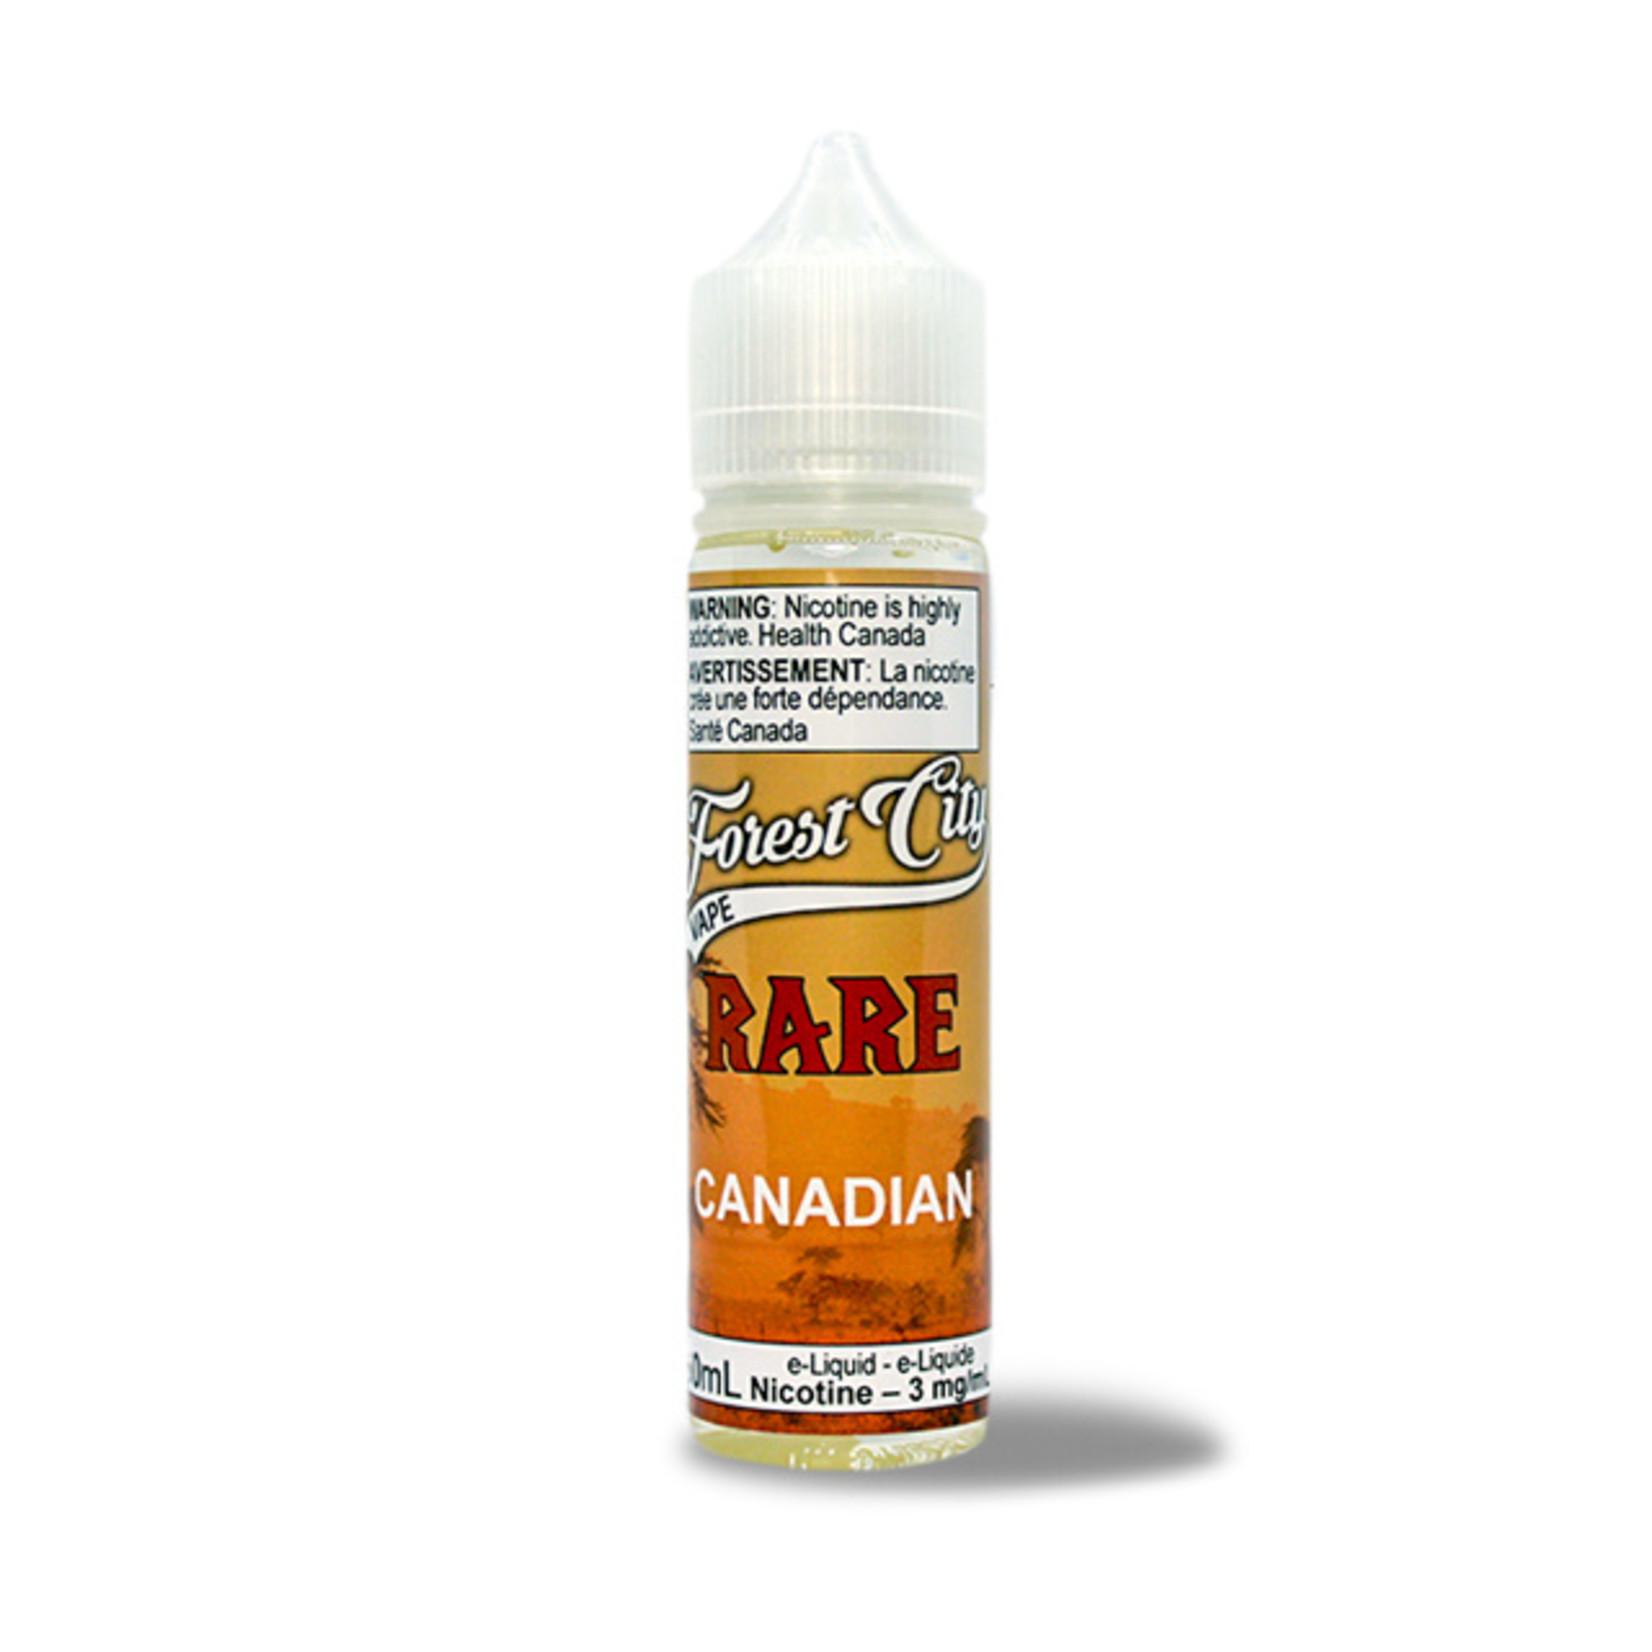 Rare Canadian